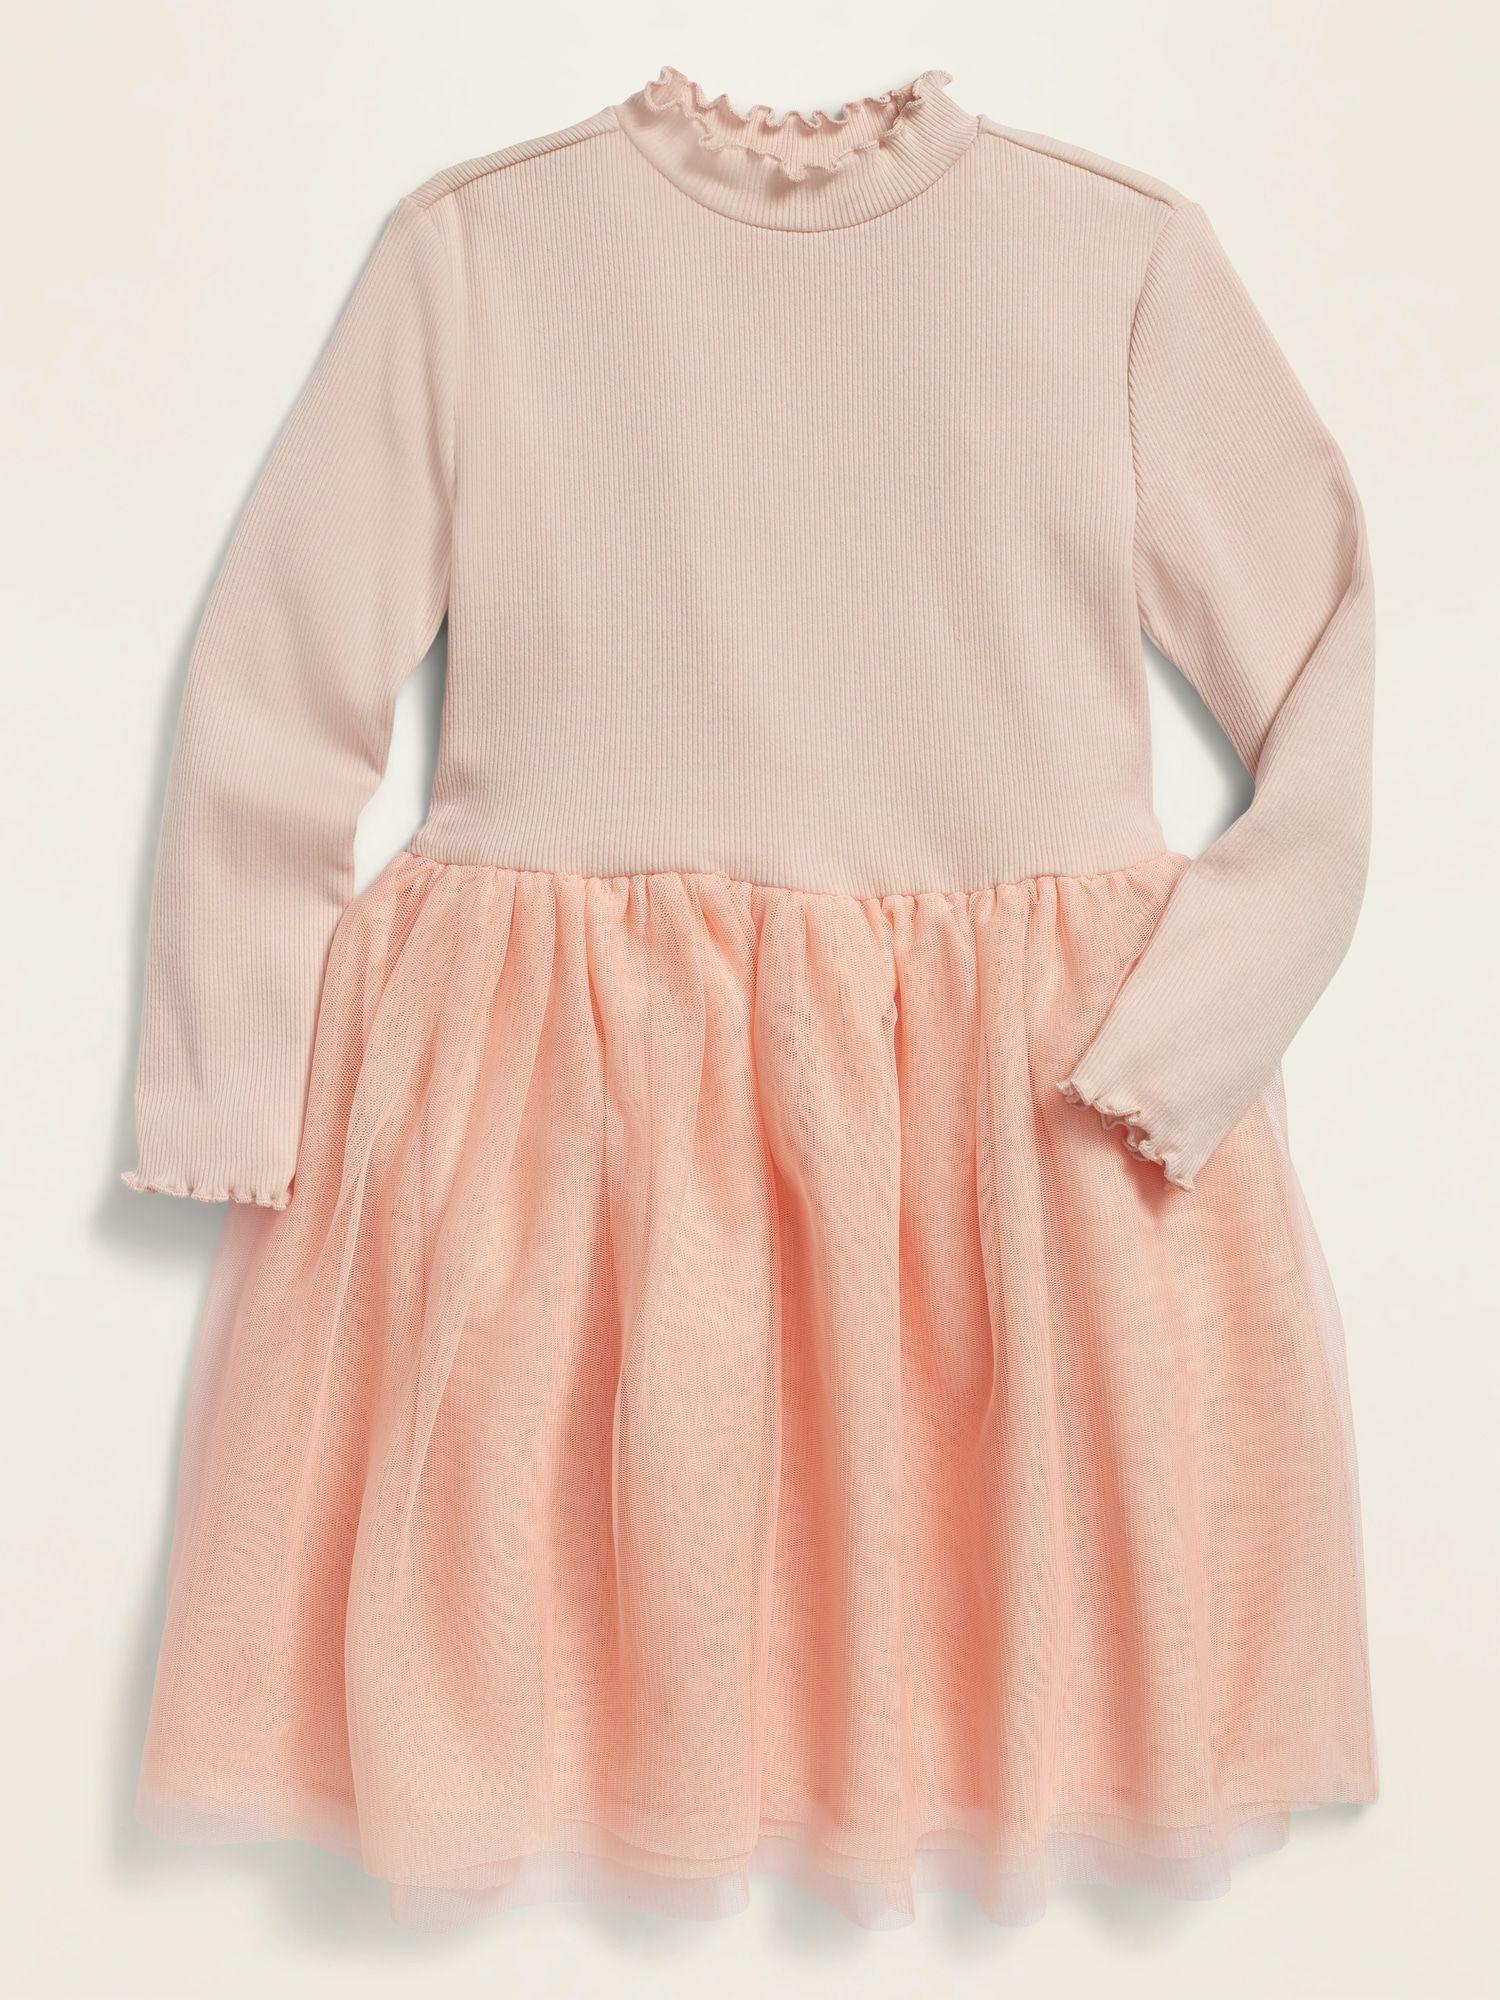 Old Navy Long Sleeve Rib Knit Tutu Dress For Toddler Girls Shell Pink Size 5t Toddler Girl Dresses Toddler Dress Toddler Girl Outfits [ 2000 x 1500 Pixel ]